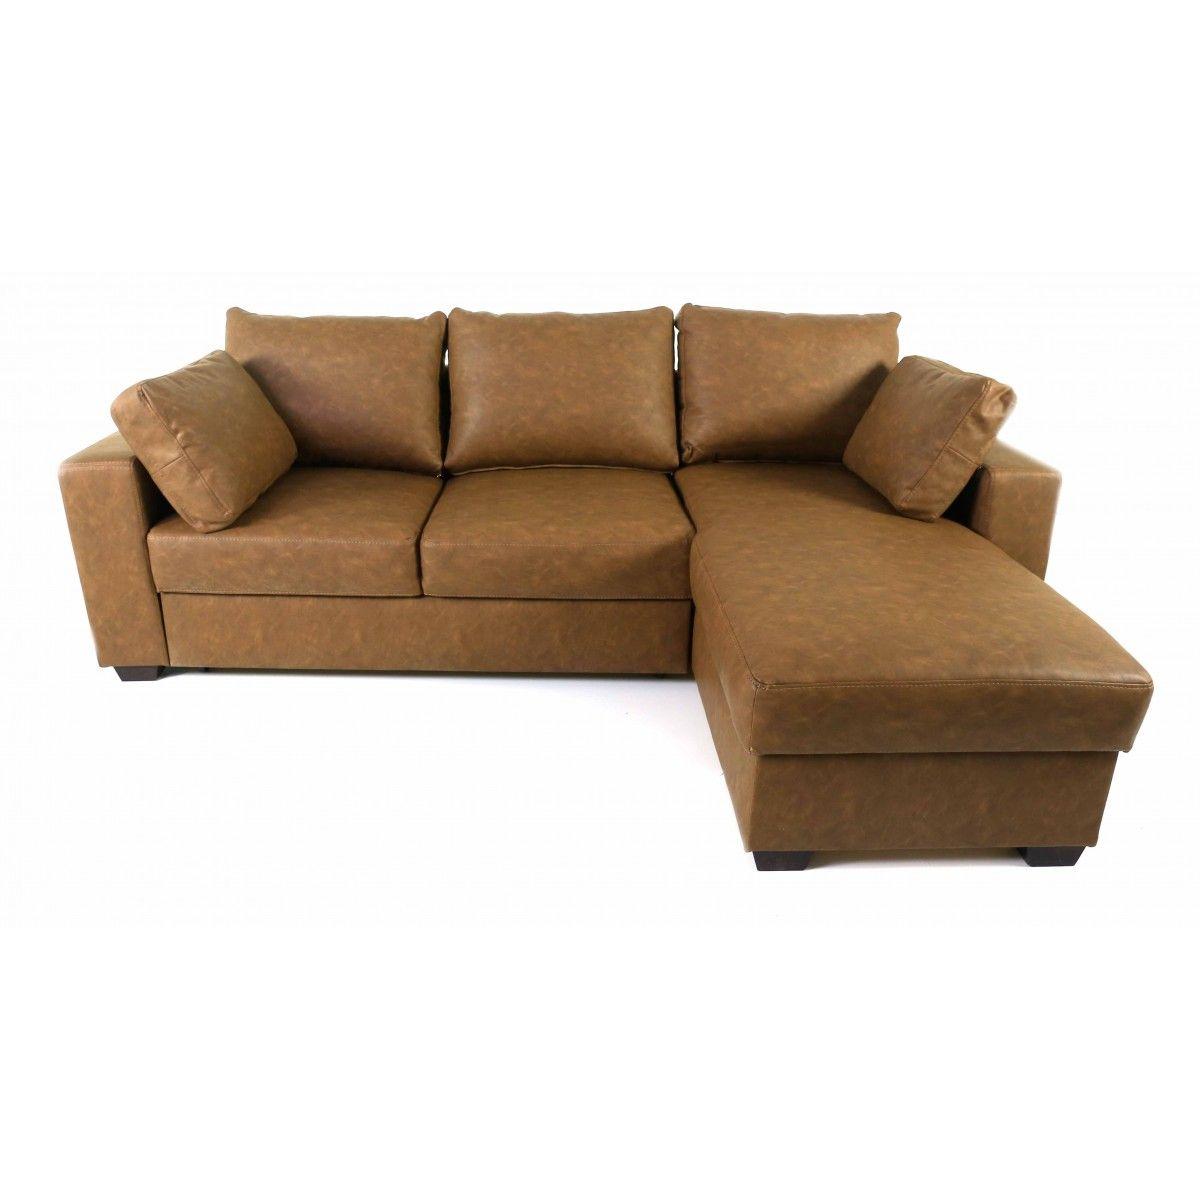 Canapé d angle convertible simili cuir chocolat Vintage